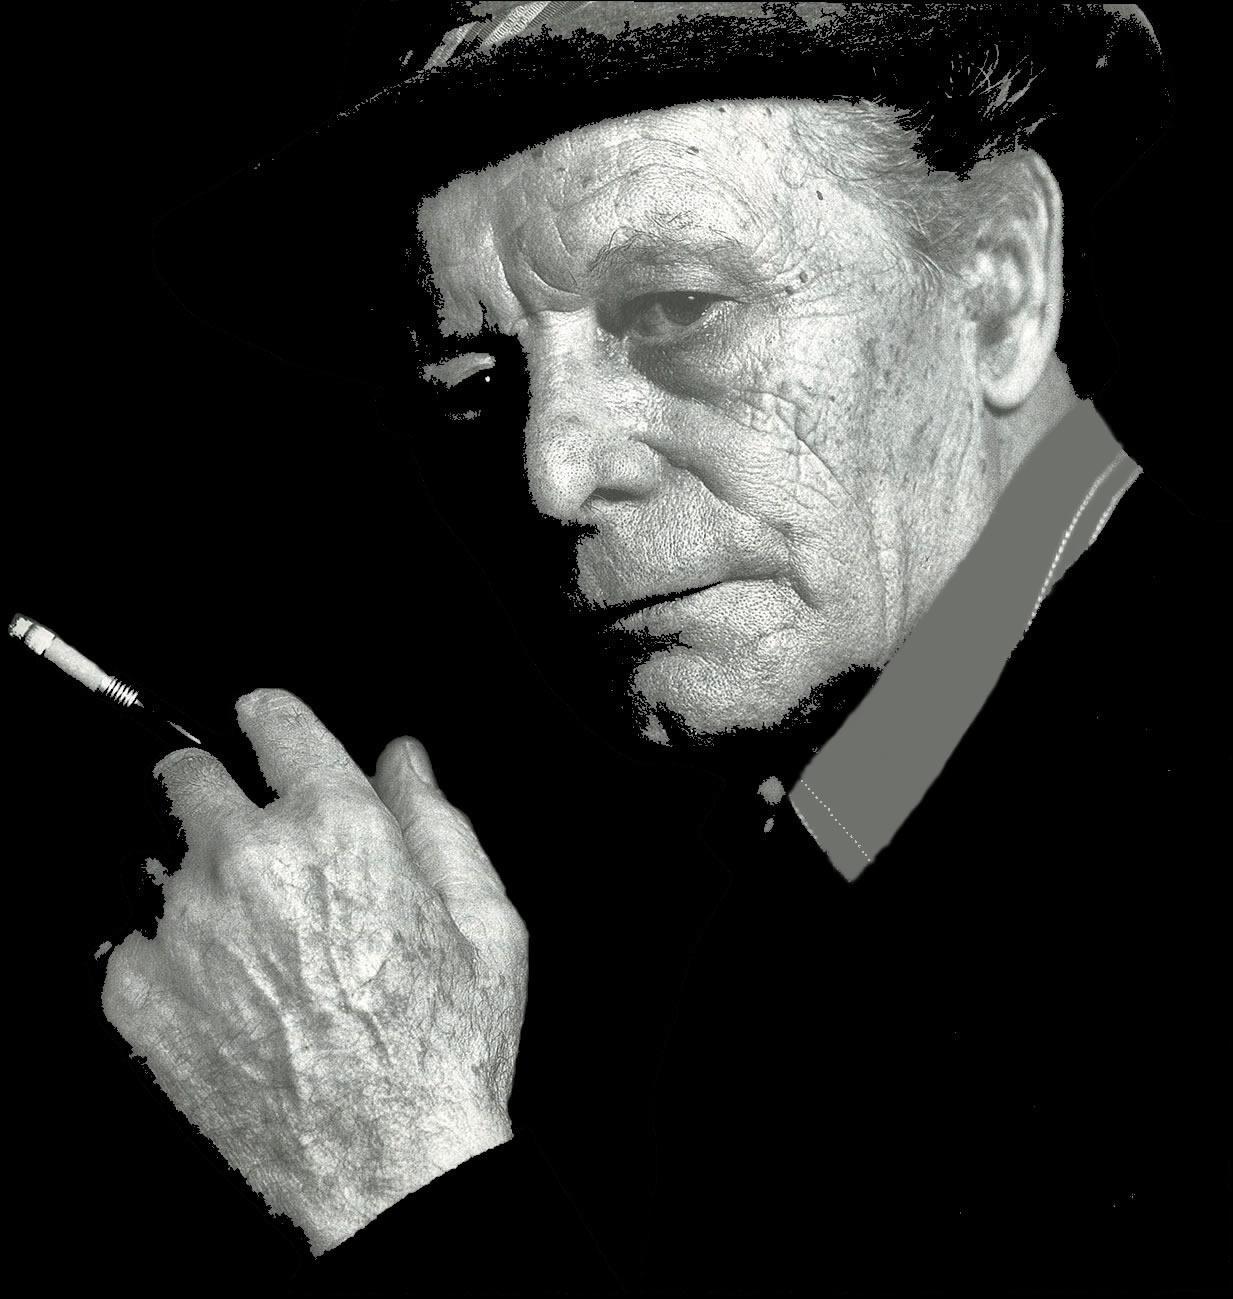 https://www.florartearenzano.com/wp-content/uploads/2012/04/agenorefabbri_sito.jpg